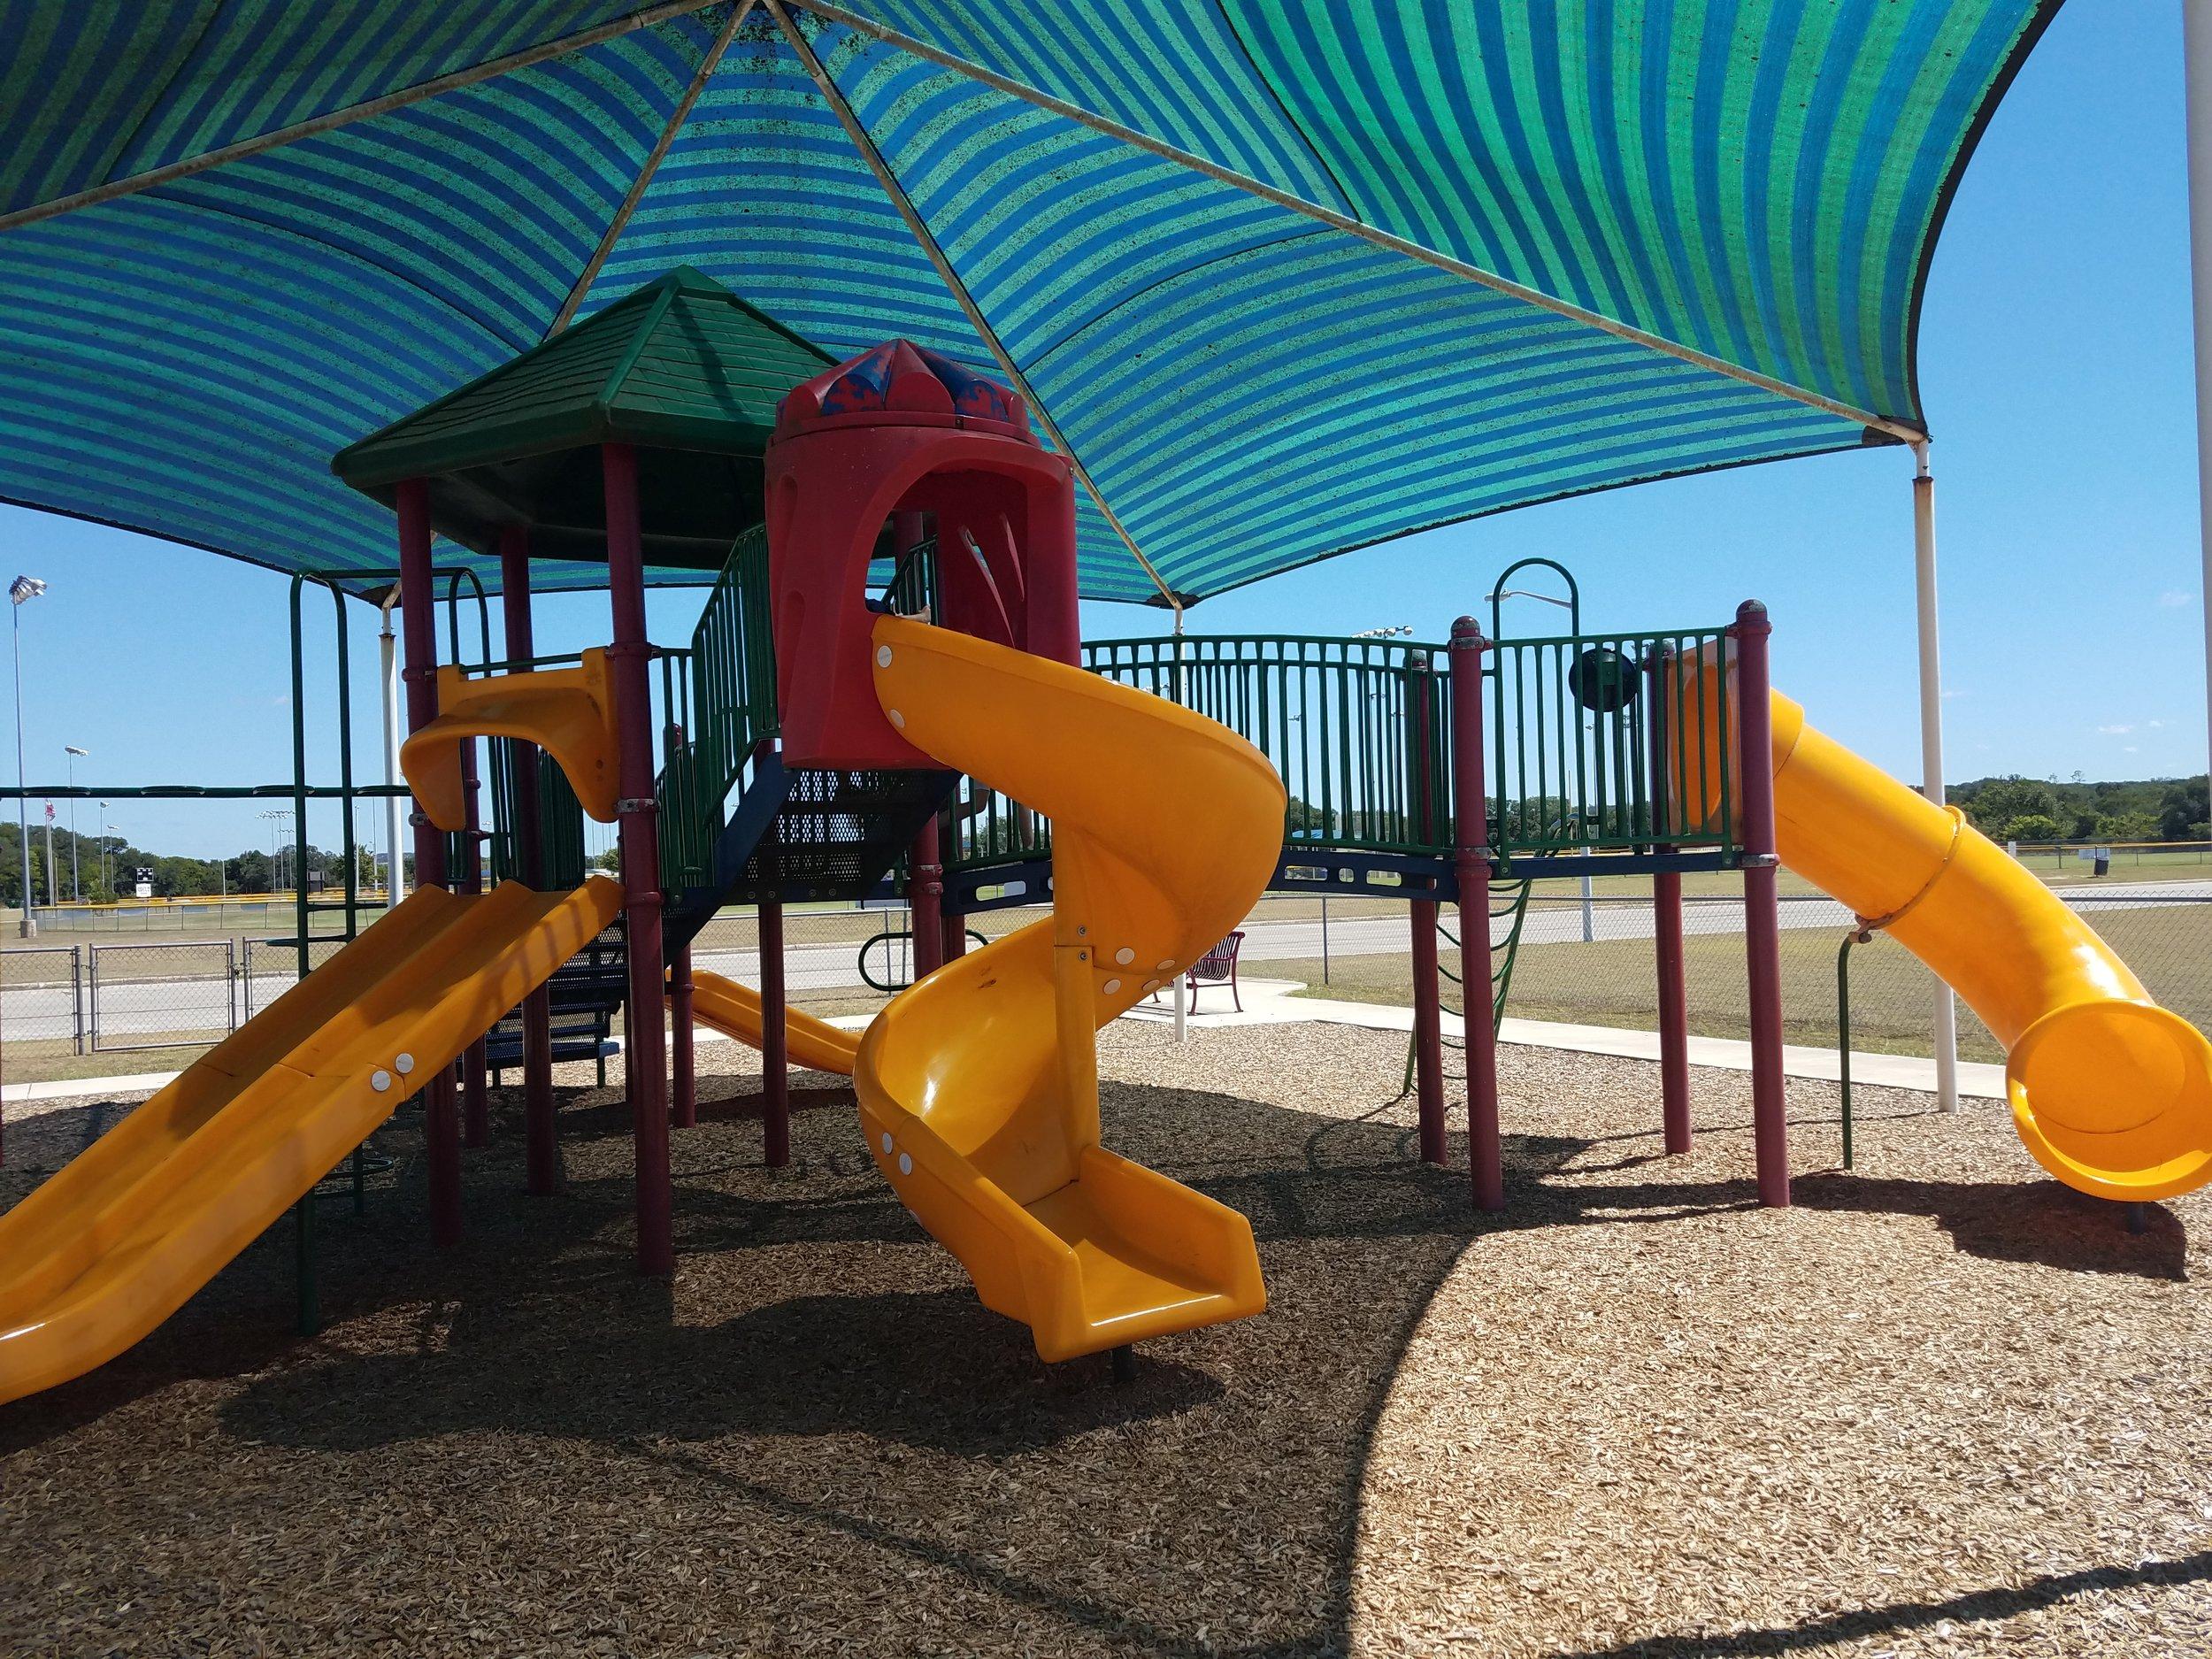 boerne texas - city parks